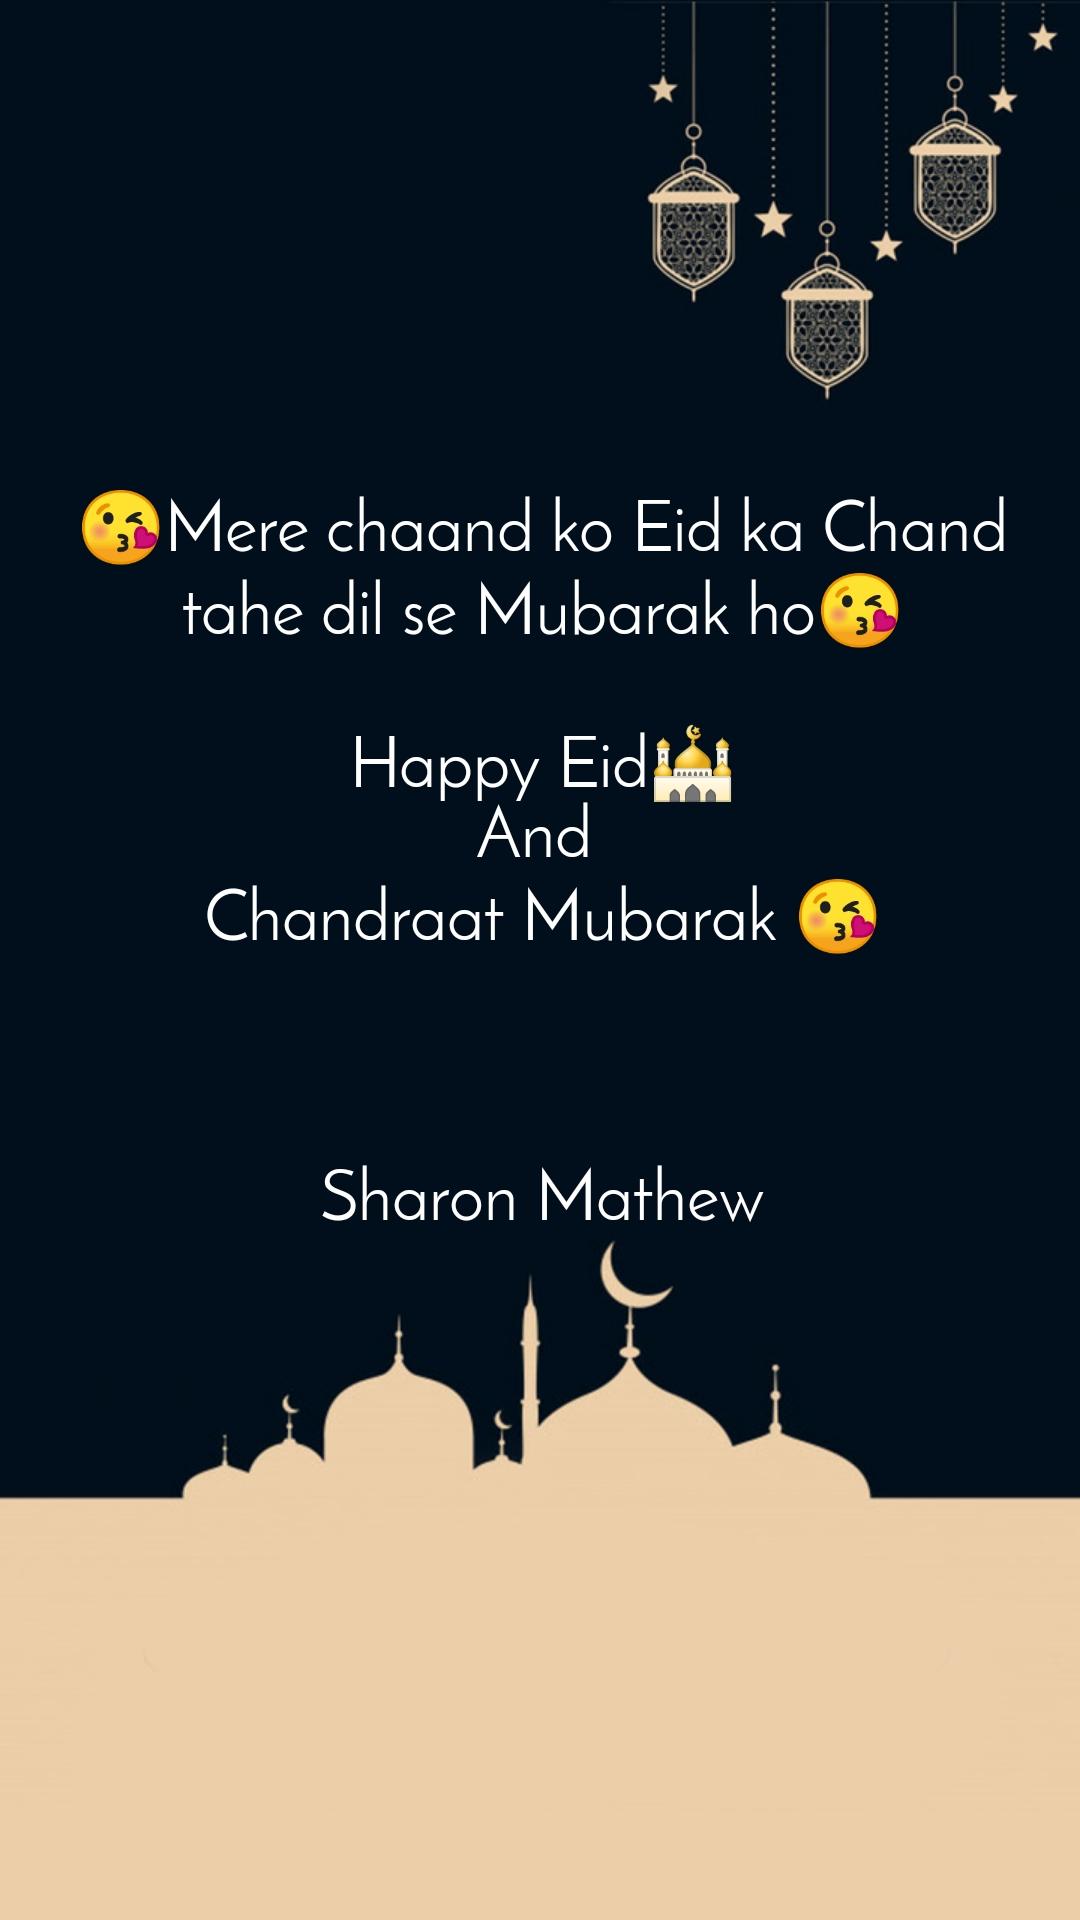 😘Mere chaand ko Eid ka Chand tahe dil se Mubarak ho😘  Happy Eid🕌 And  Chandraat Mubarak 😘    Sharon Mathew